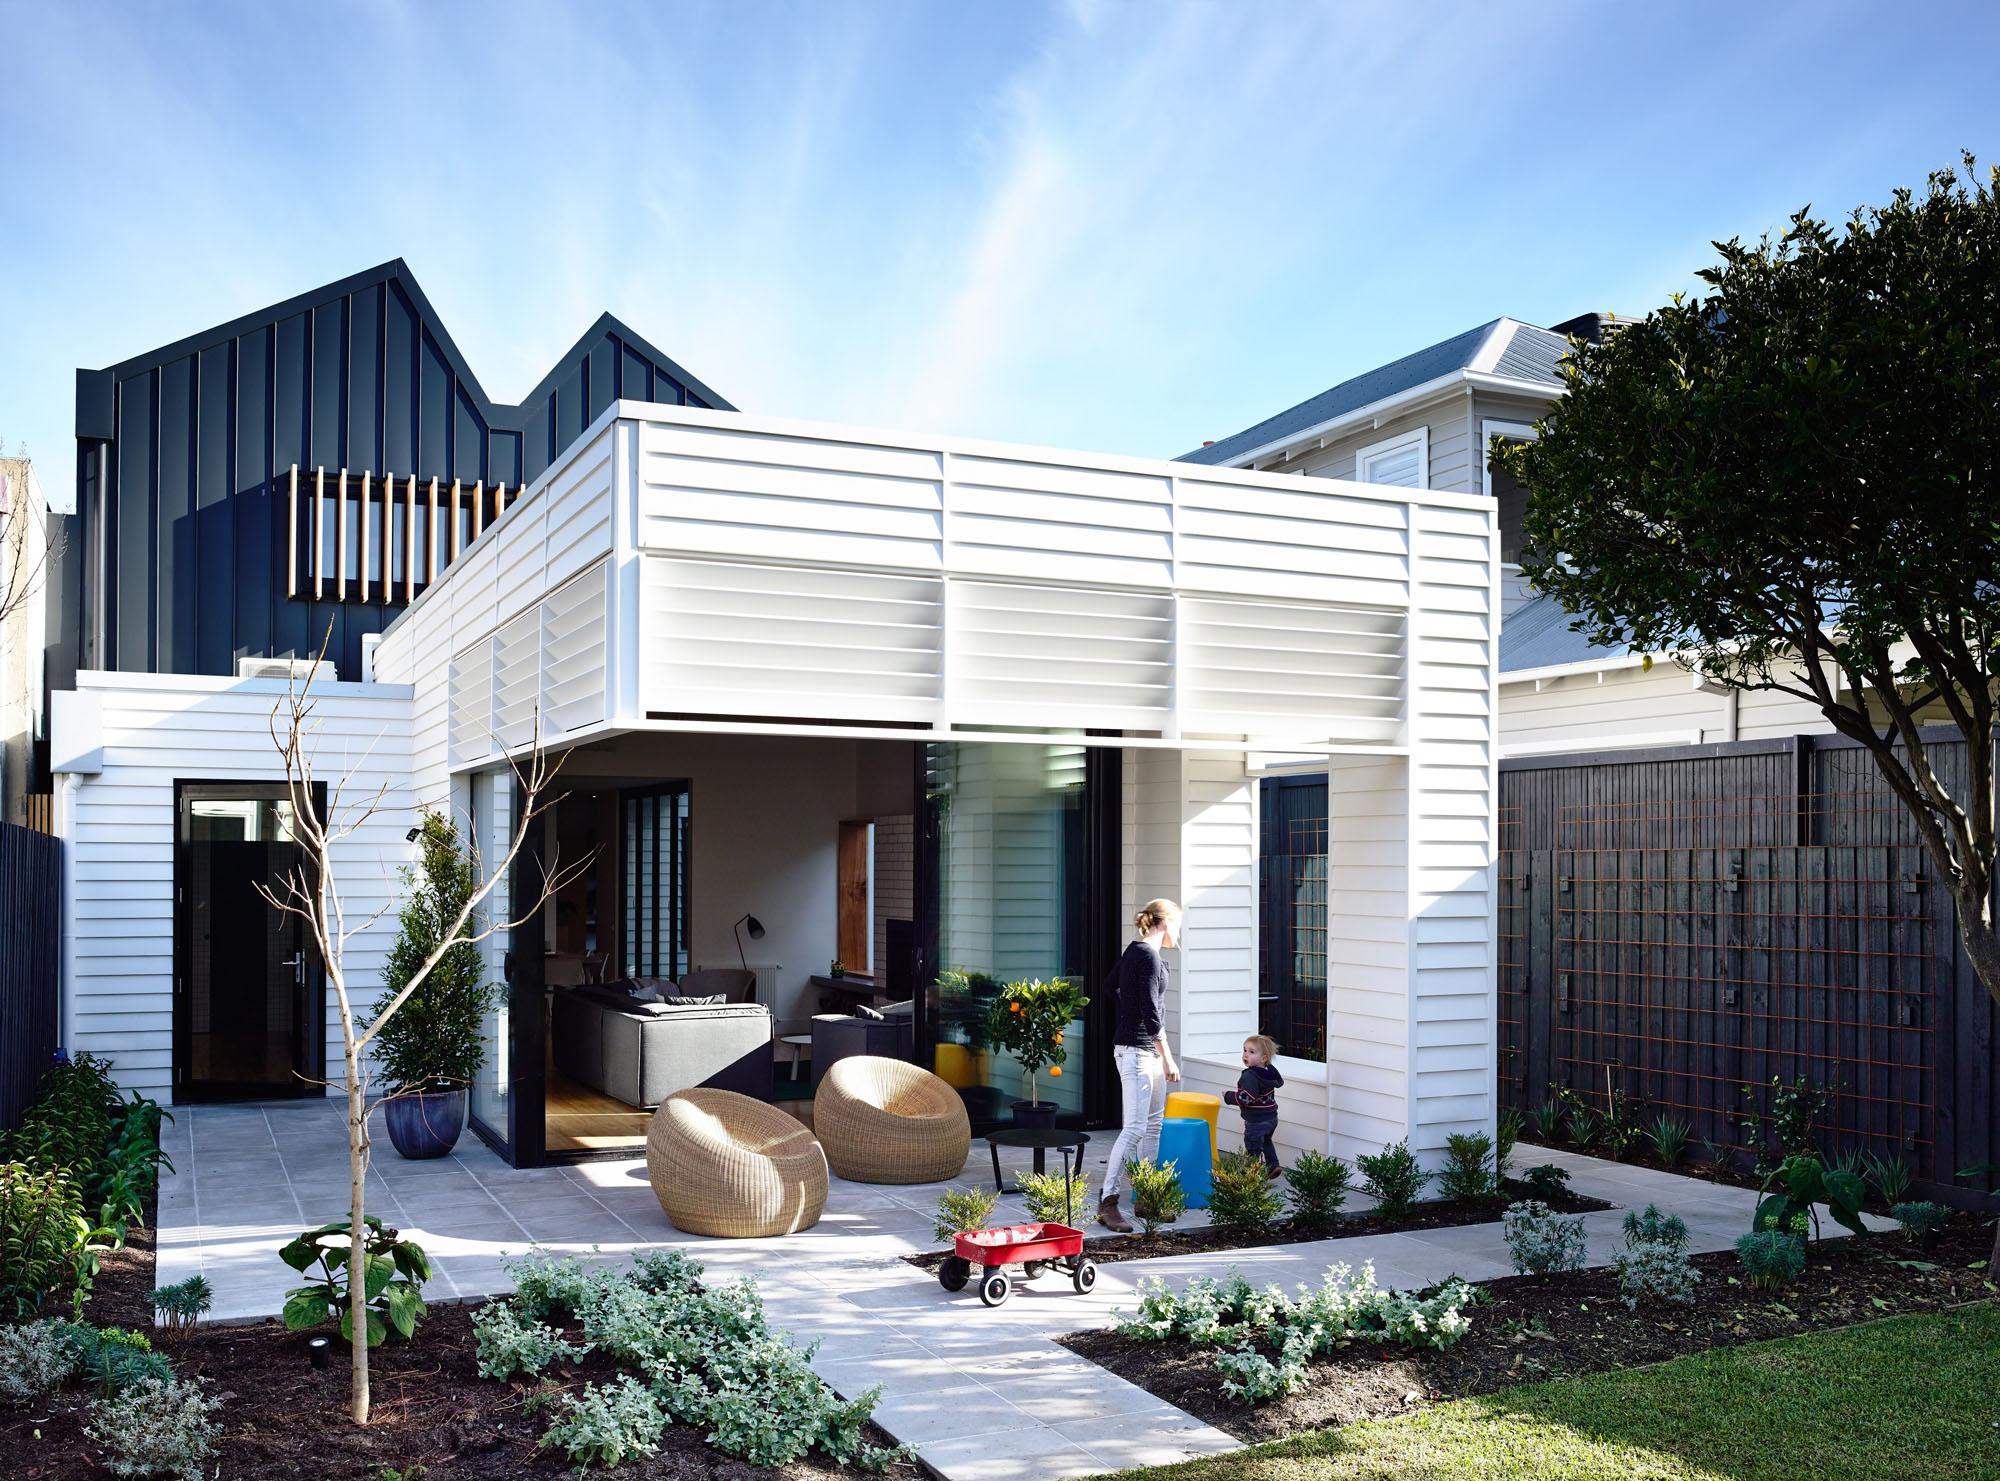 Casa de campo reconstruida como un hogar divertido y moderno 2